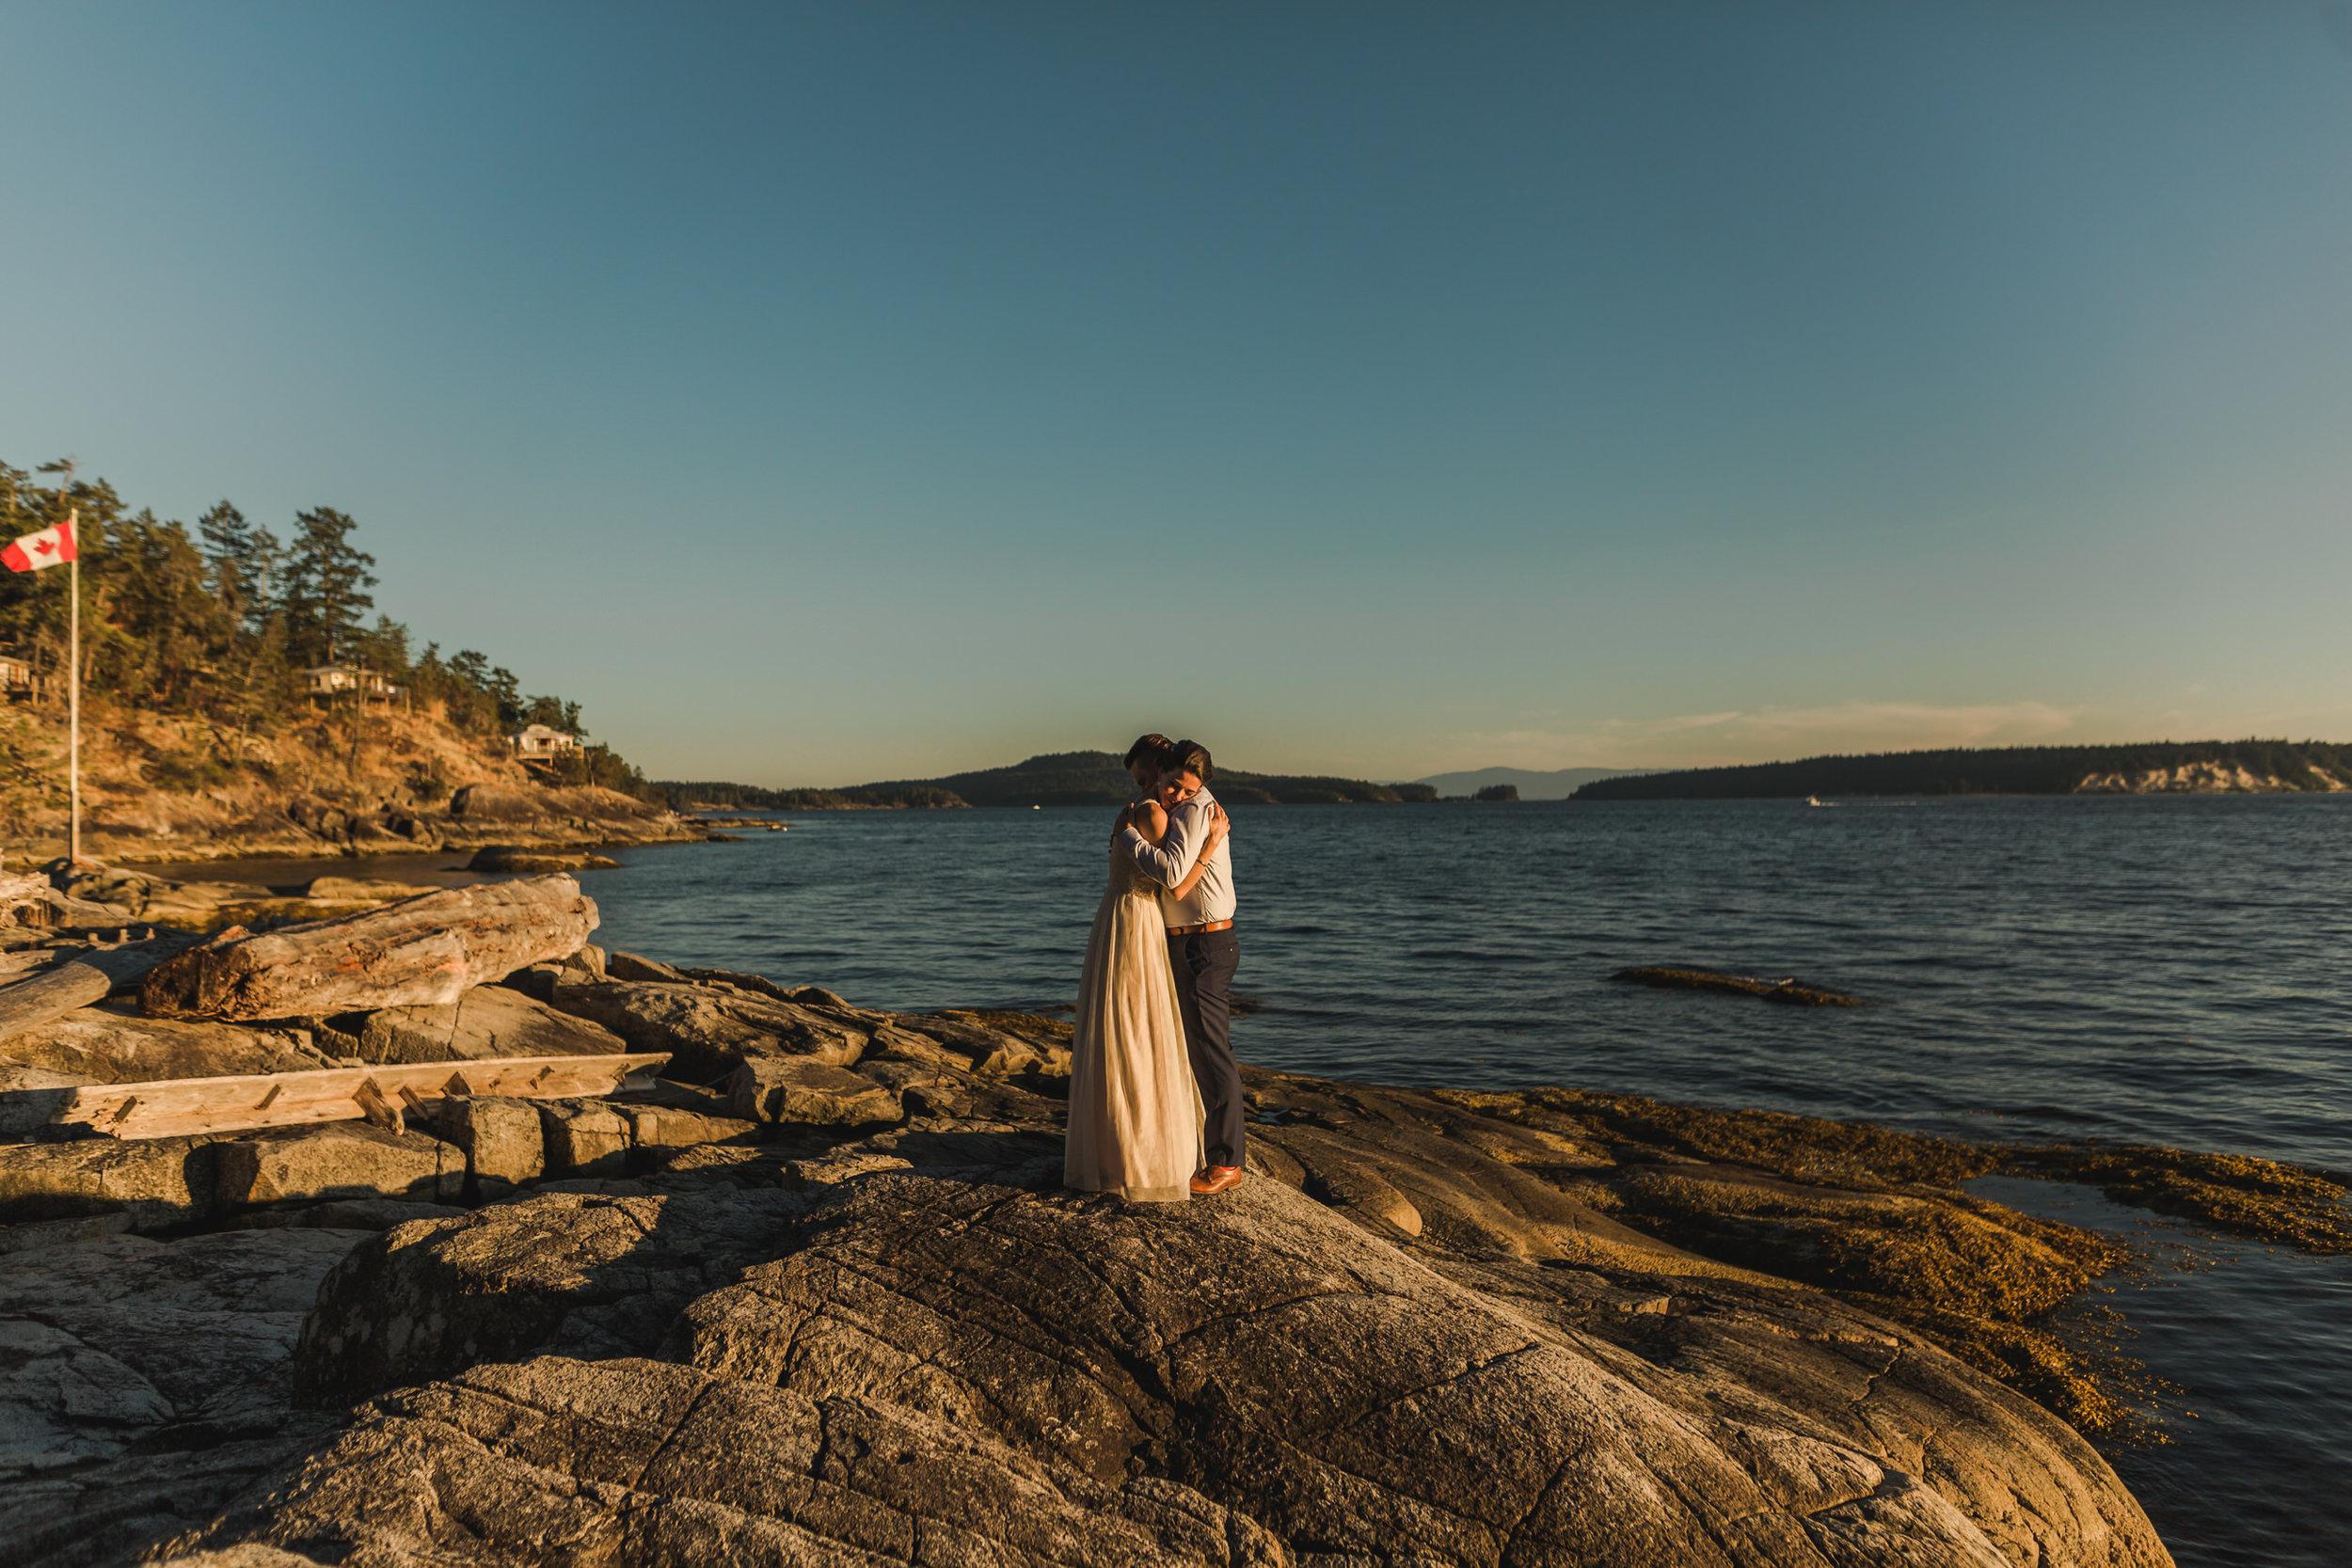 Rockwater Secret Cove Resort Wedding - Sunshine Coast BC Wedding Photographer - Vancouver Wedding Photographer - Sunshine Coast Elopement Photos - IMG_1793.jpg